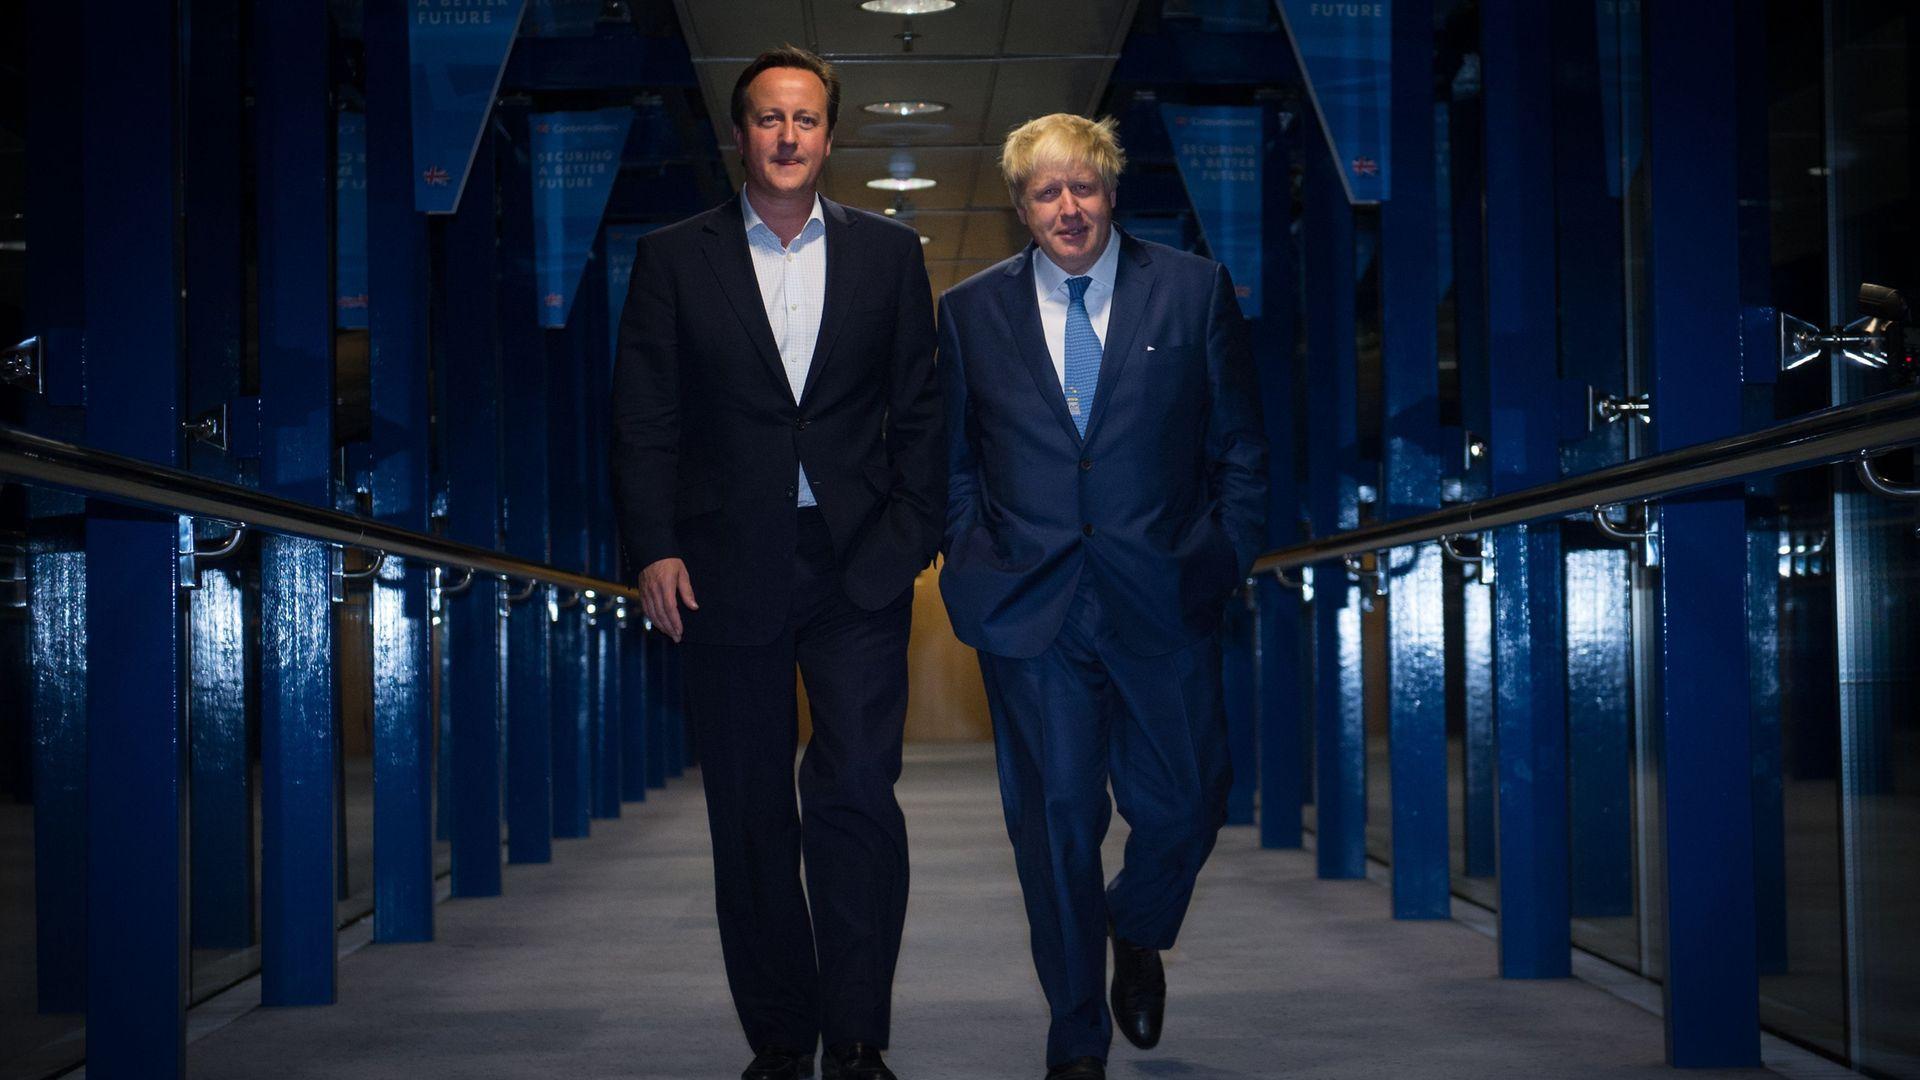 David Cameron (left) and Boris Johnson - Credit: PA